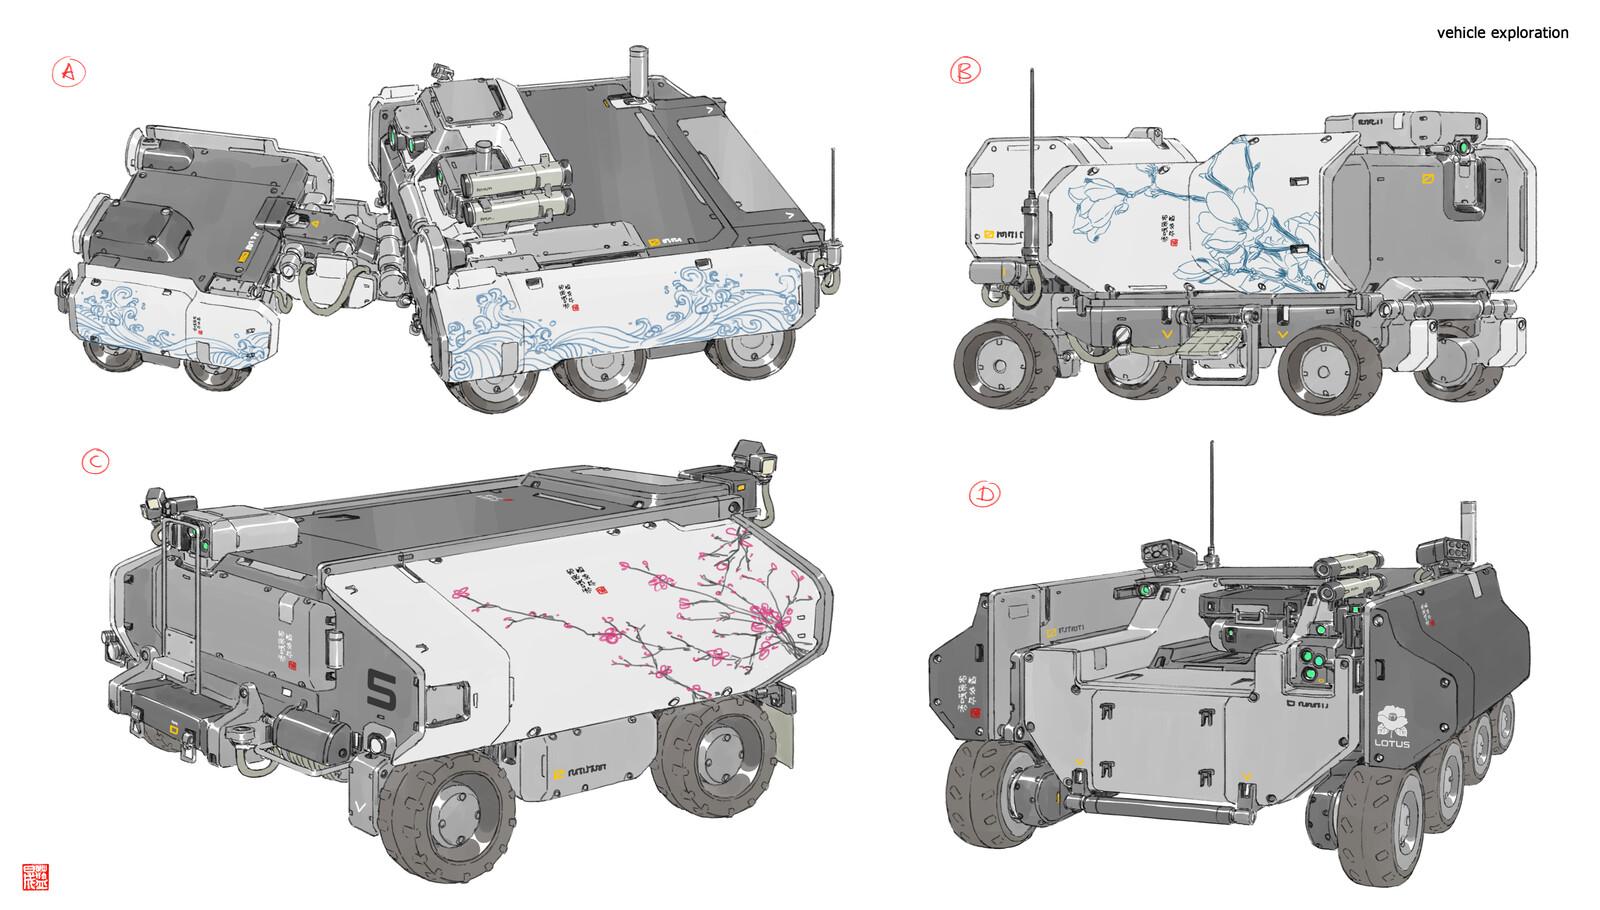 vehicle exploration